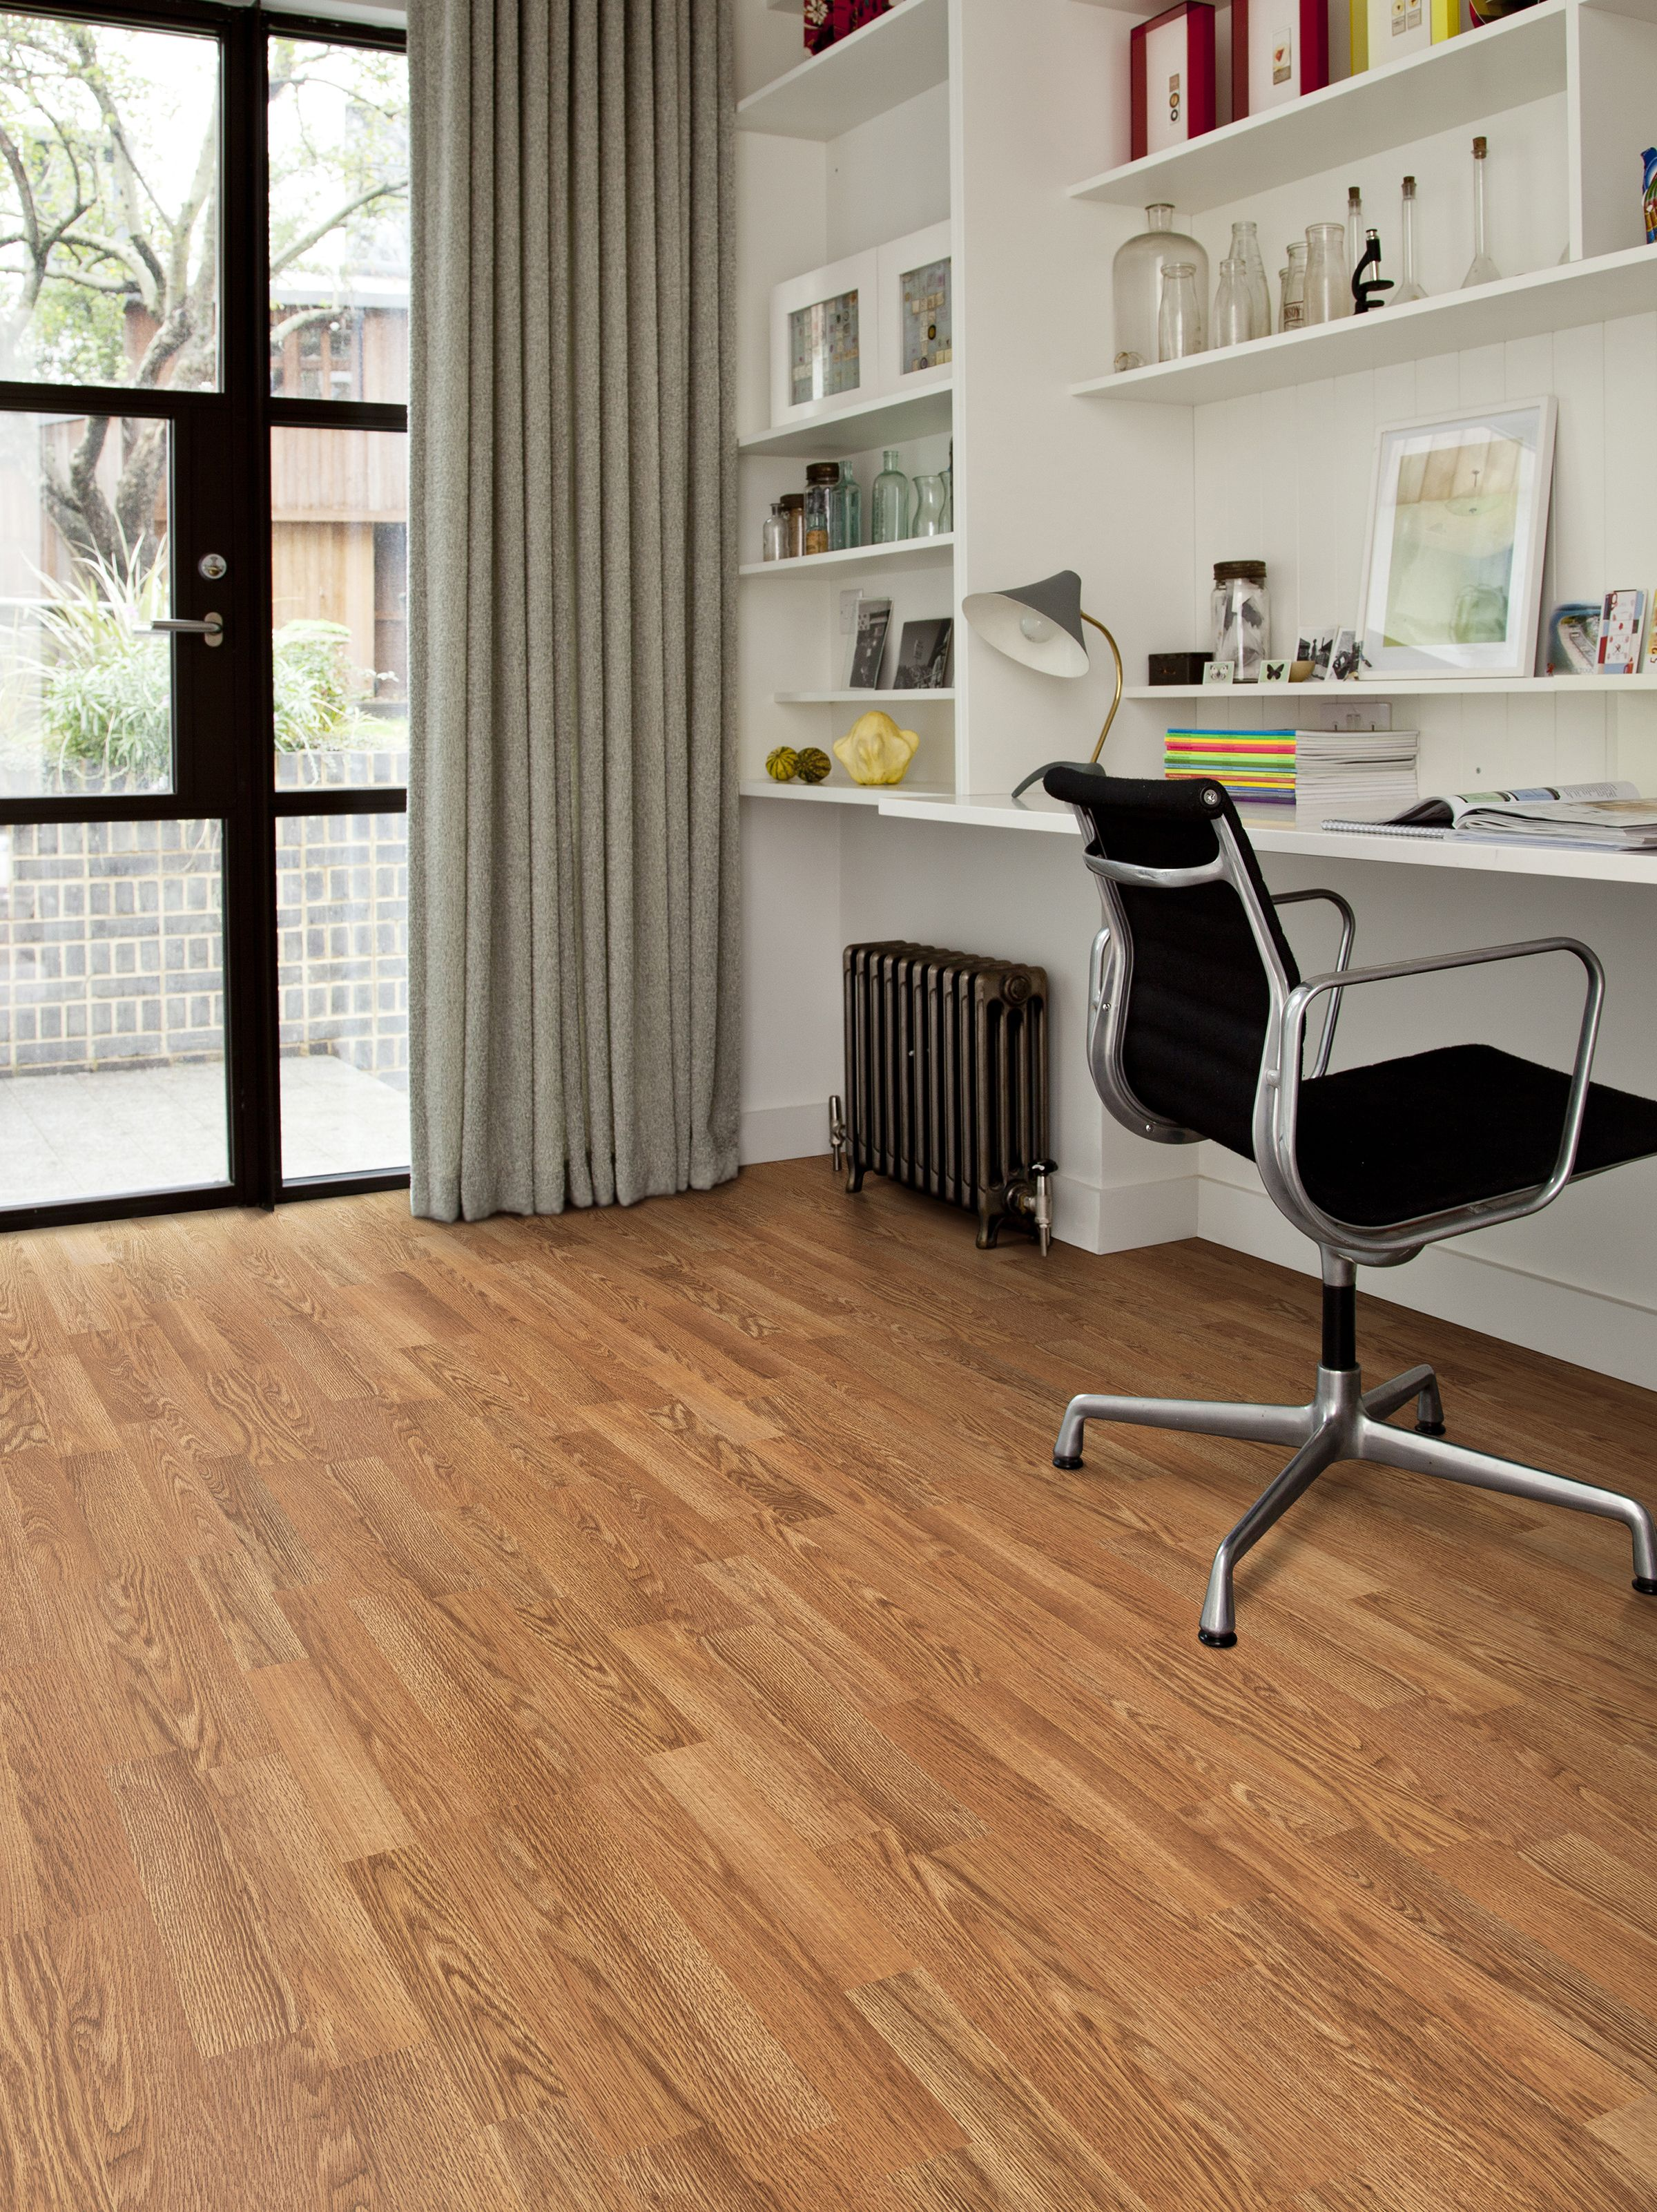 Royal Oak 258 | Laminate Floors | | Vitality Laminate ...